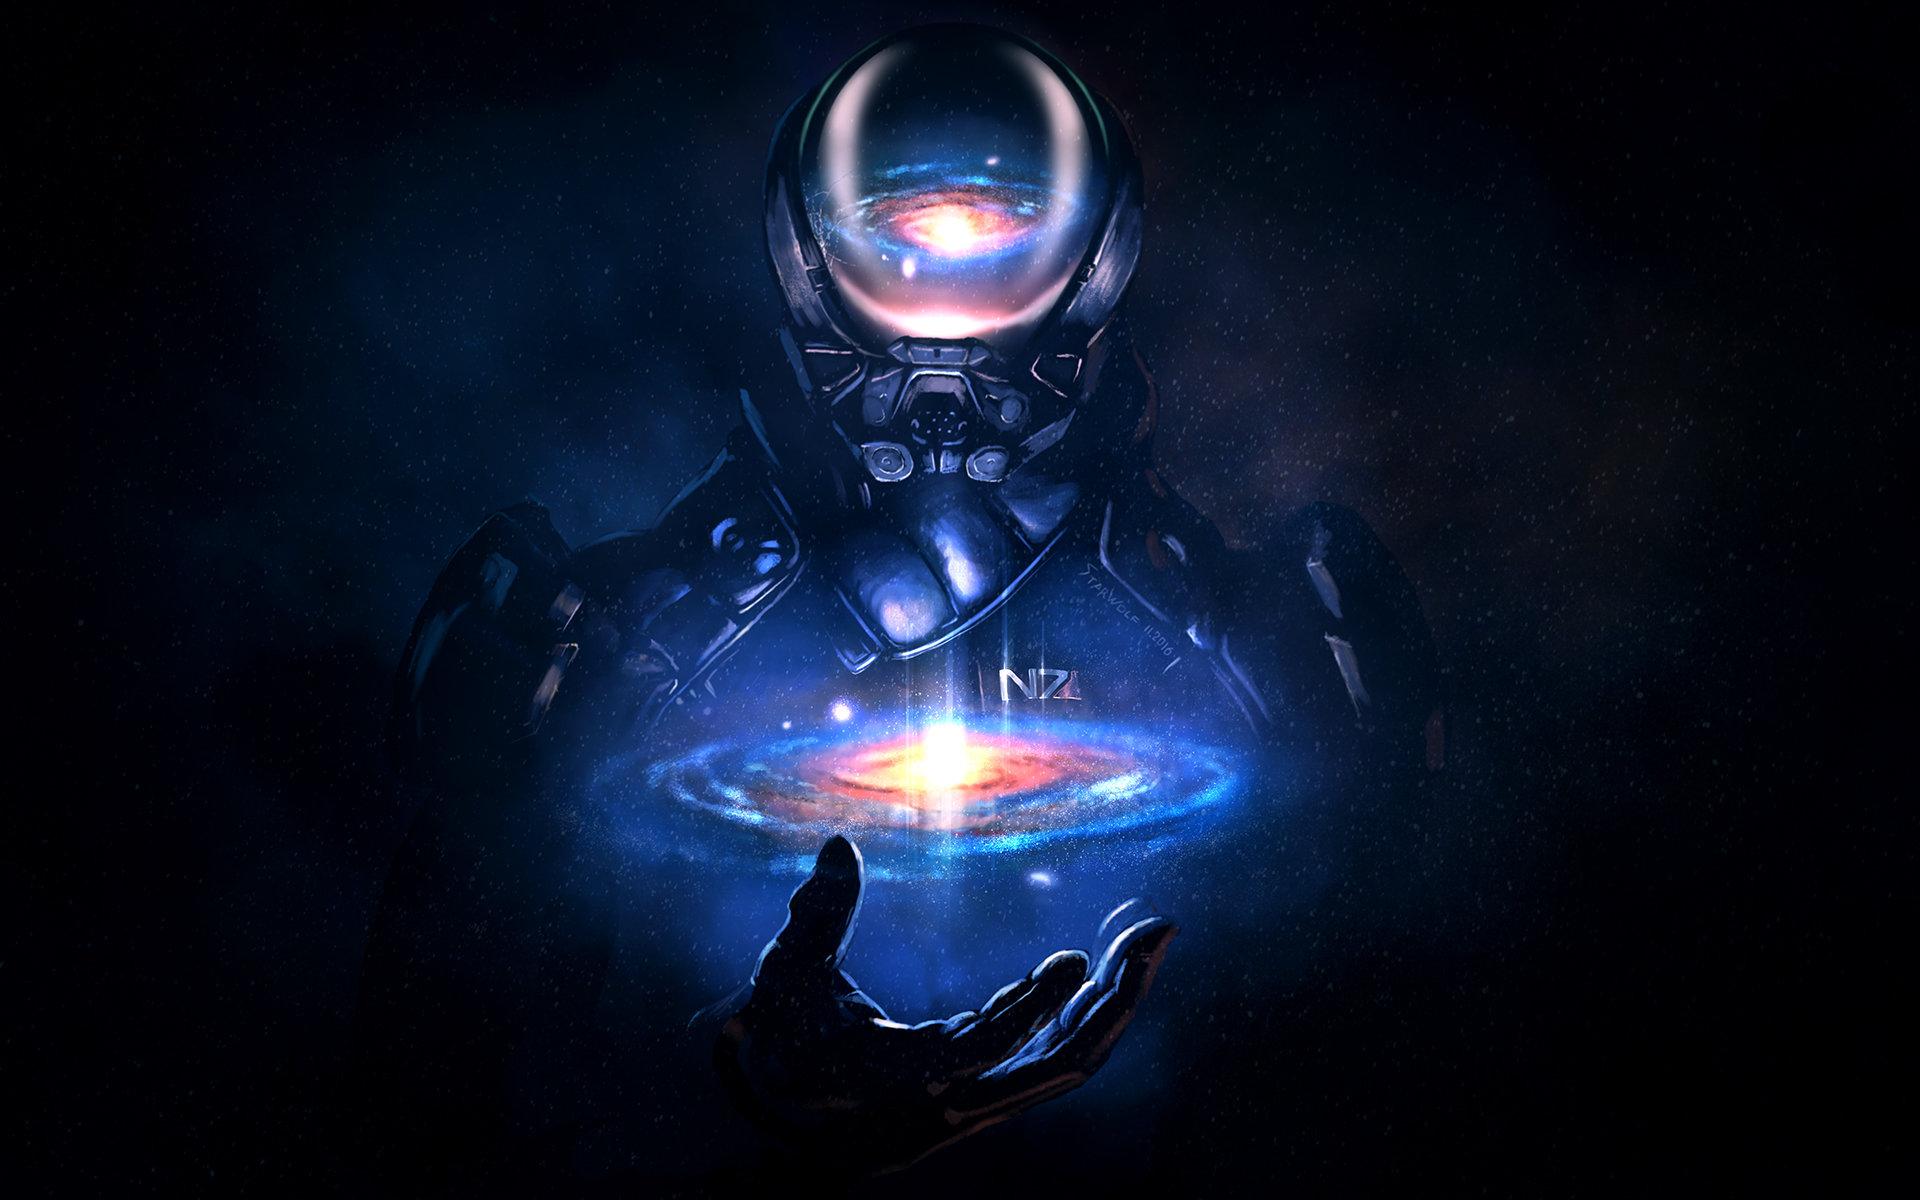 Download Hd 1920x1200 Mass Effect Andromeda Desktop Wallpaper Id